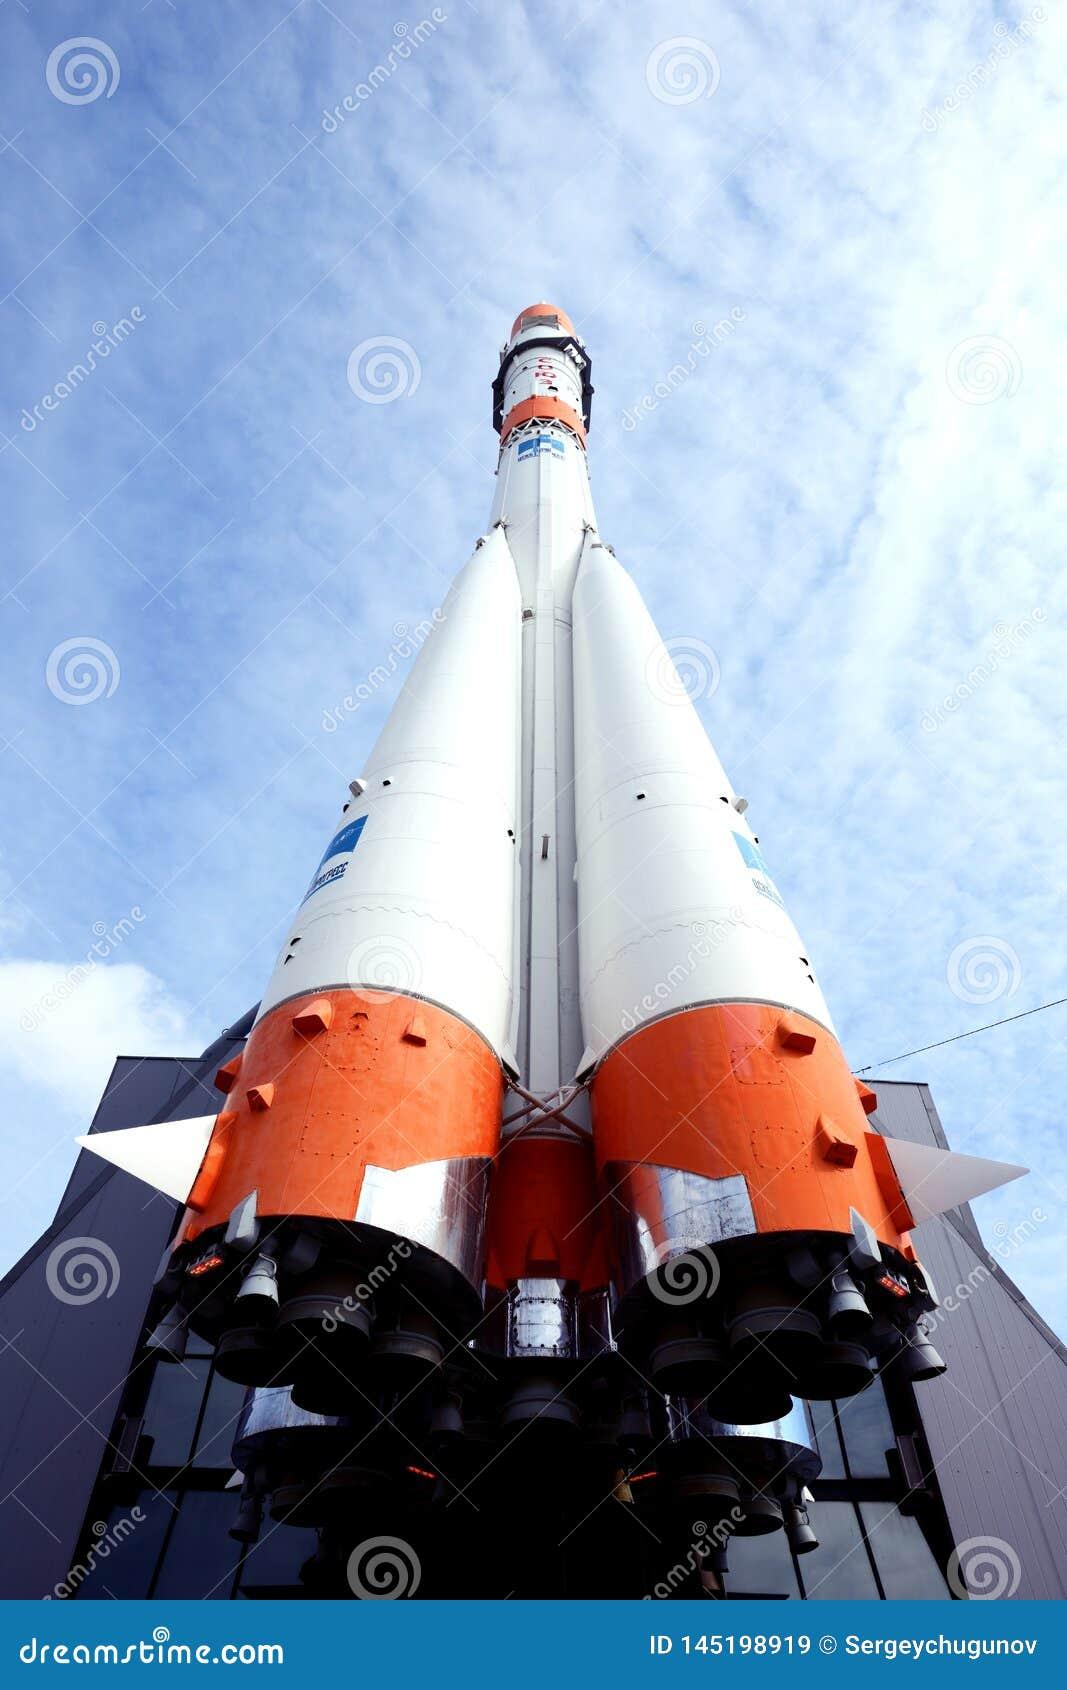 Monument av den Soyuz raket på museet av utforskning av rymden i samaraen, Ryssland